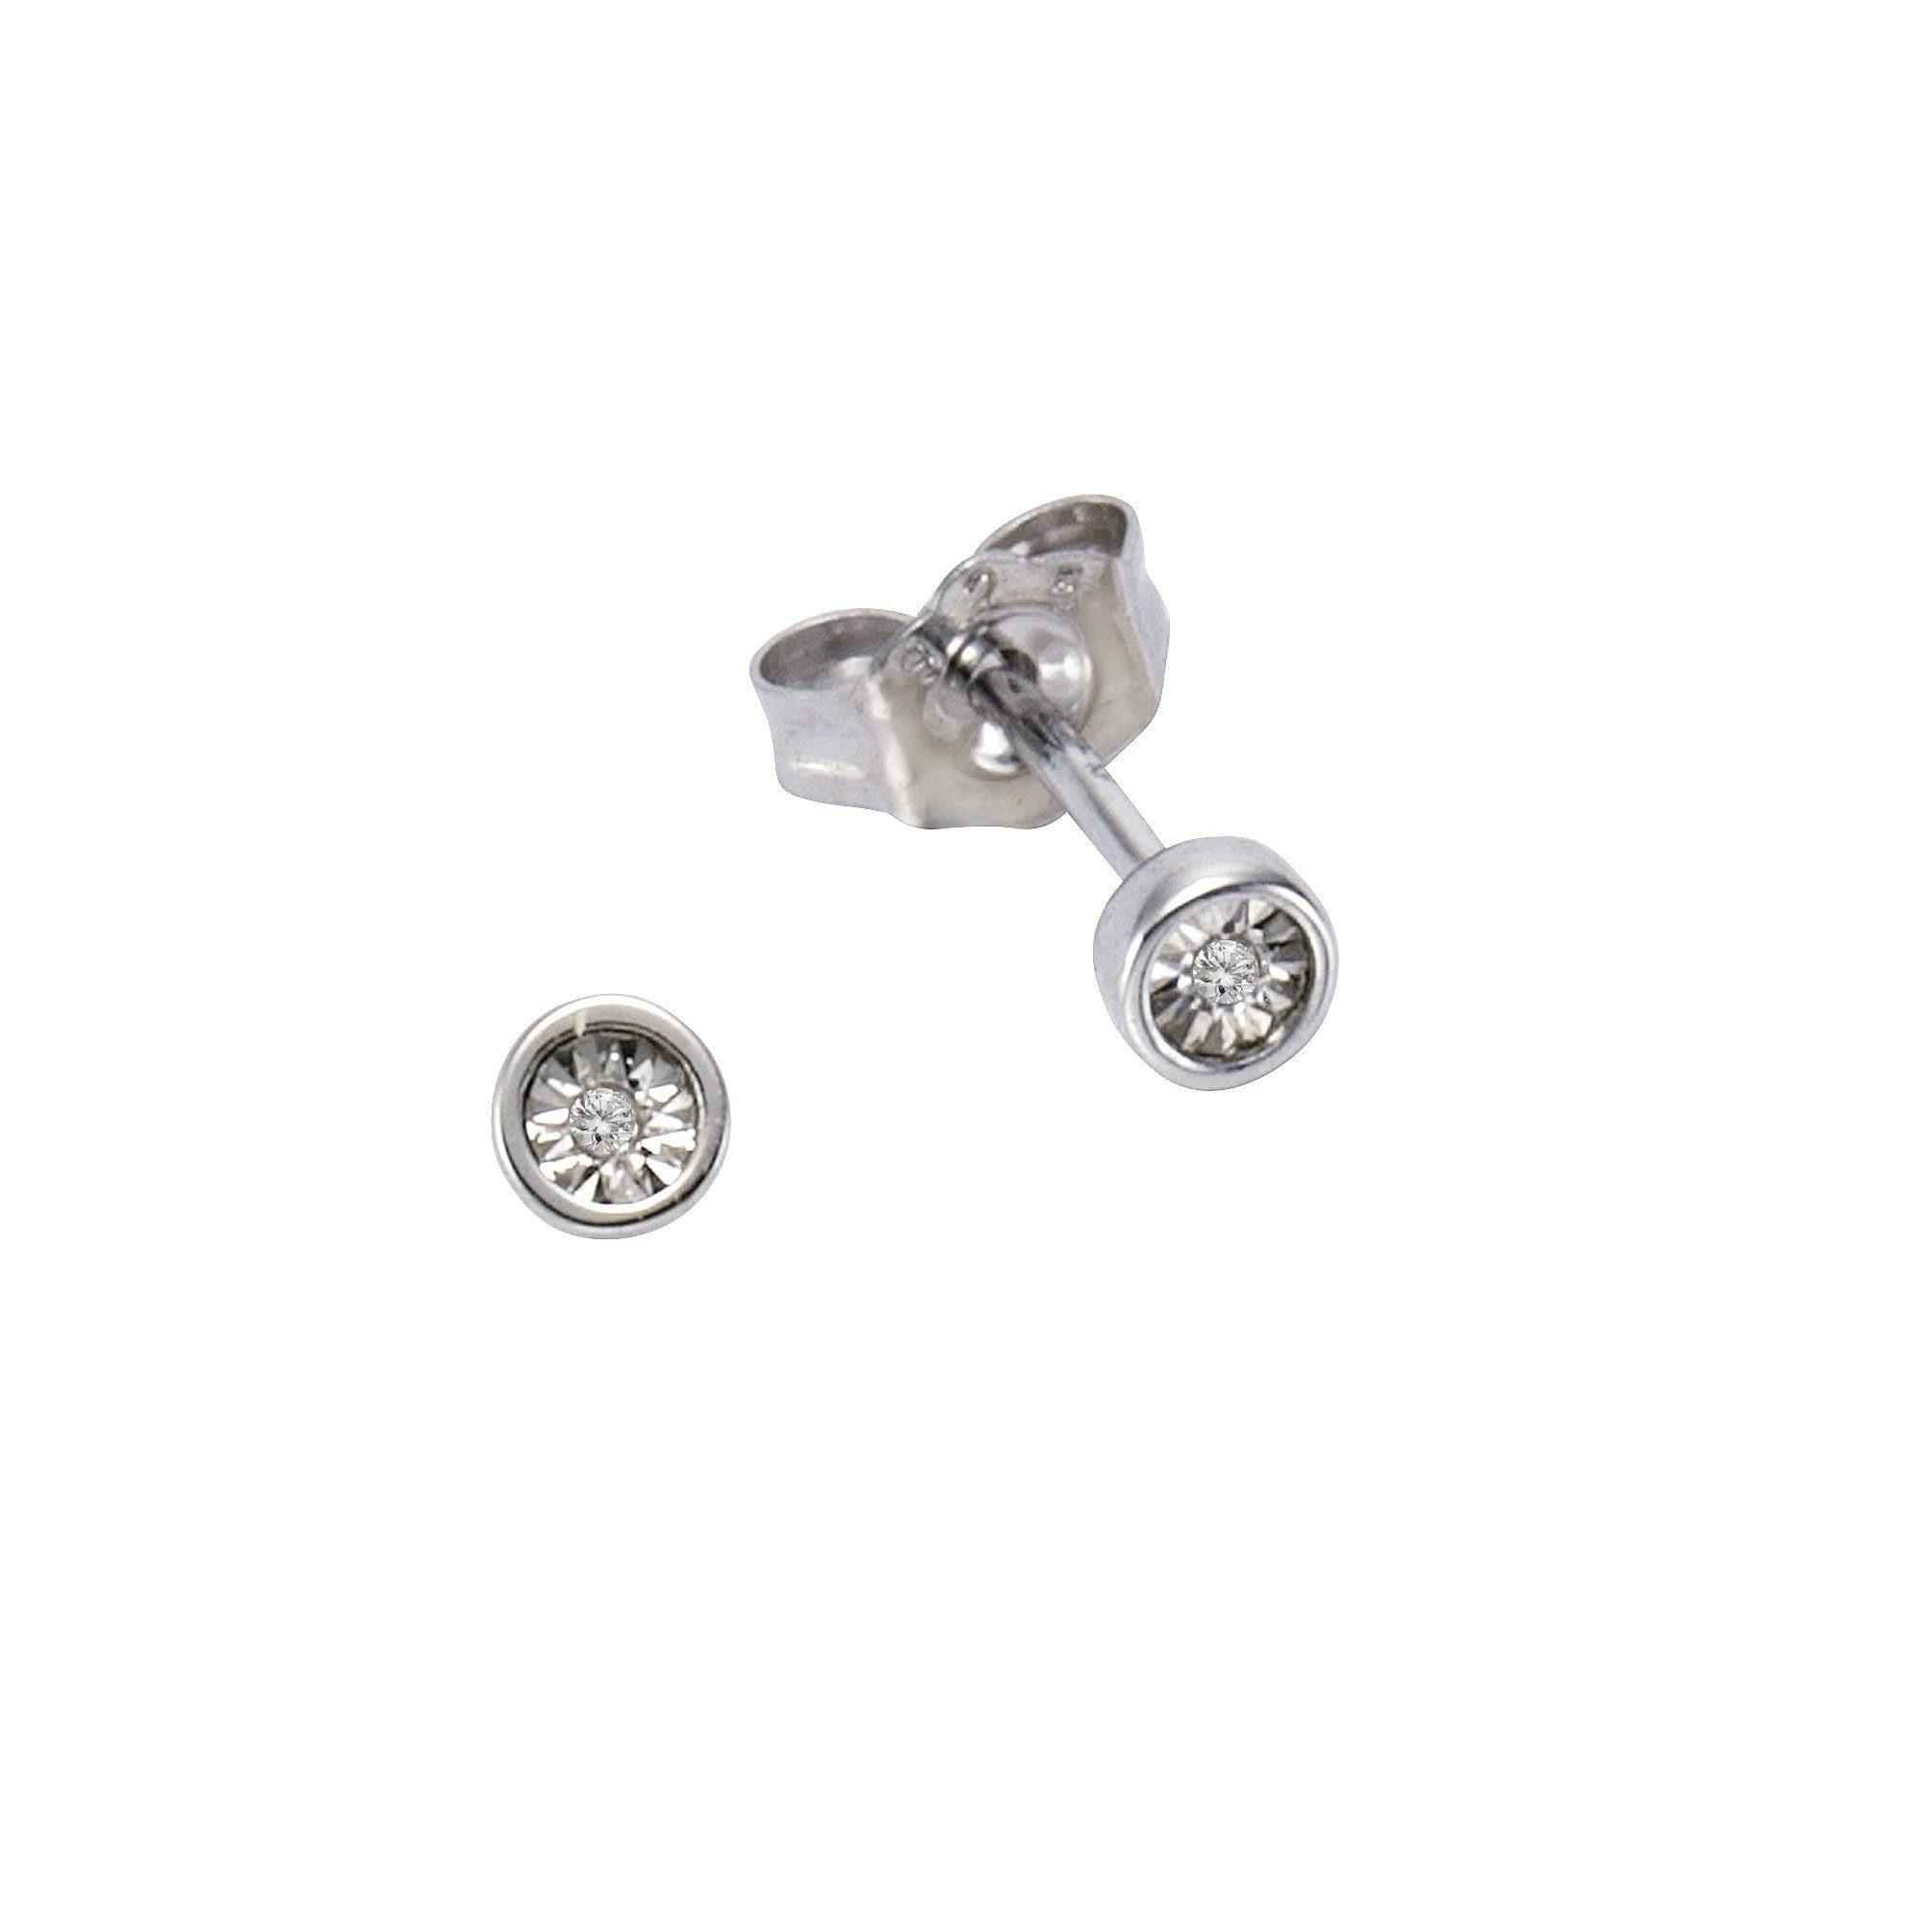 CELESTA Ohrstecker 925/- Silber 2x Diamant   Schmuck > Ohrschmuck & Ohrringe > Ohrstecker   Celesta